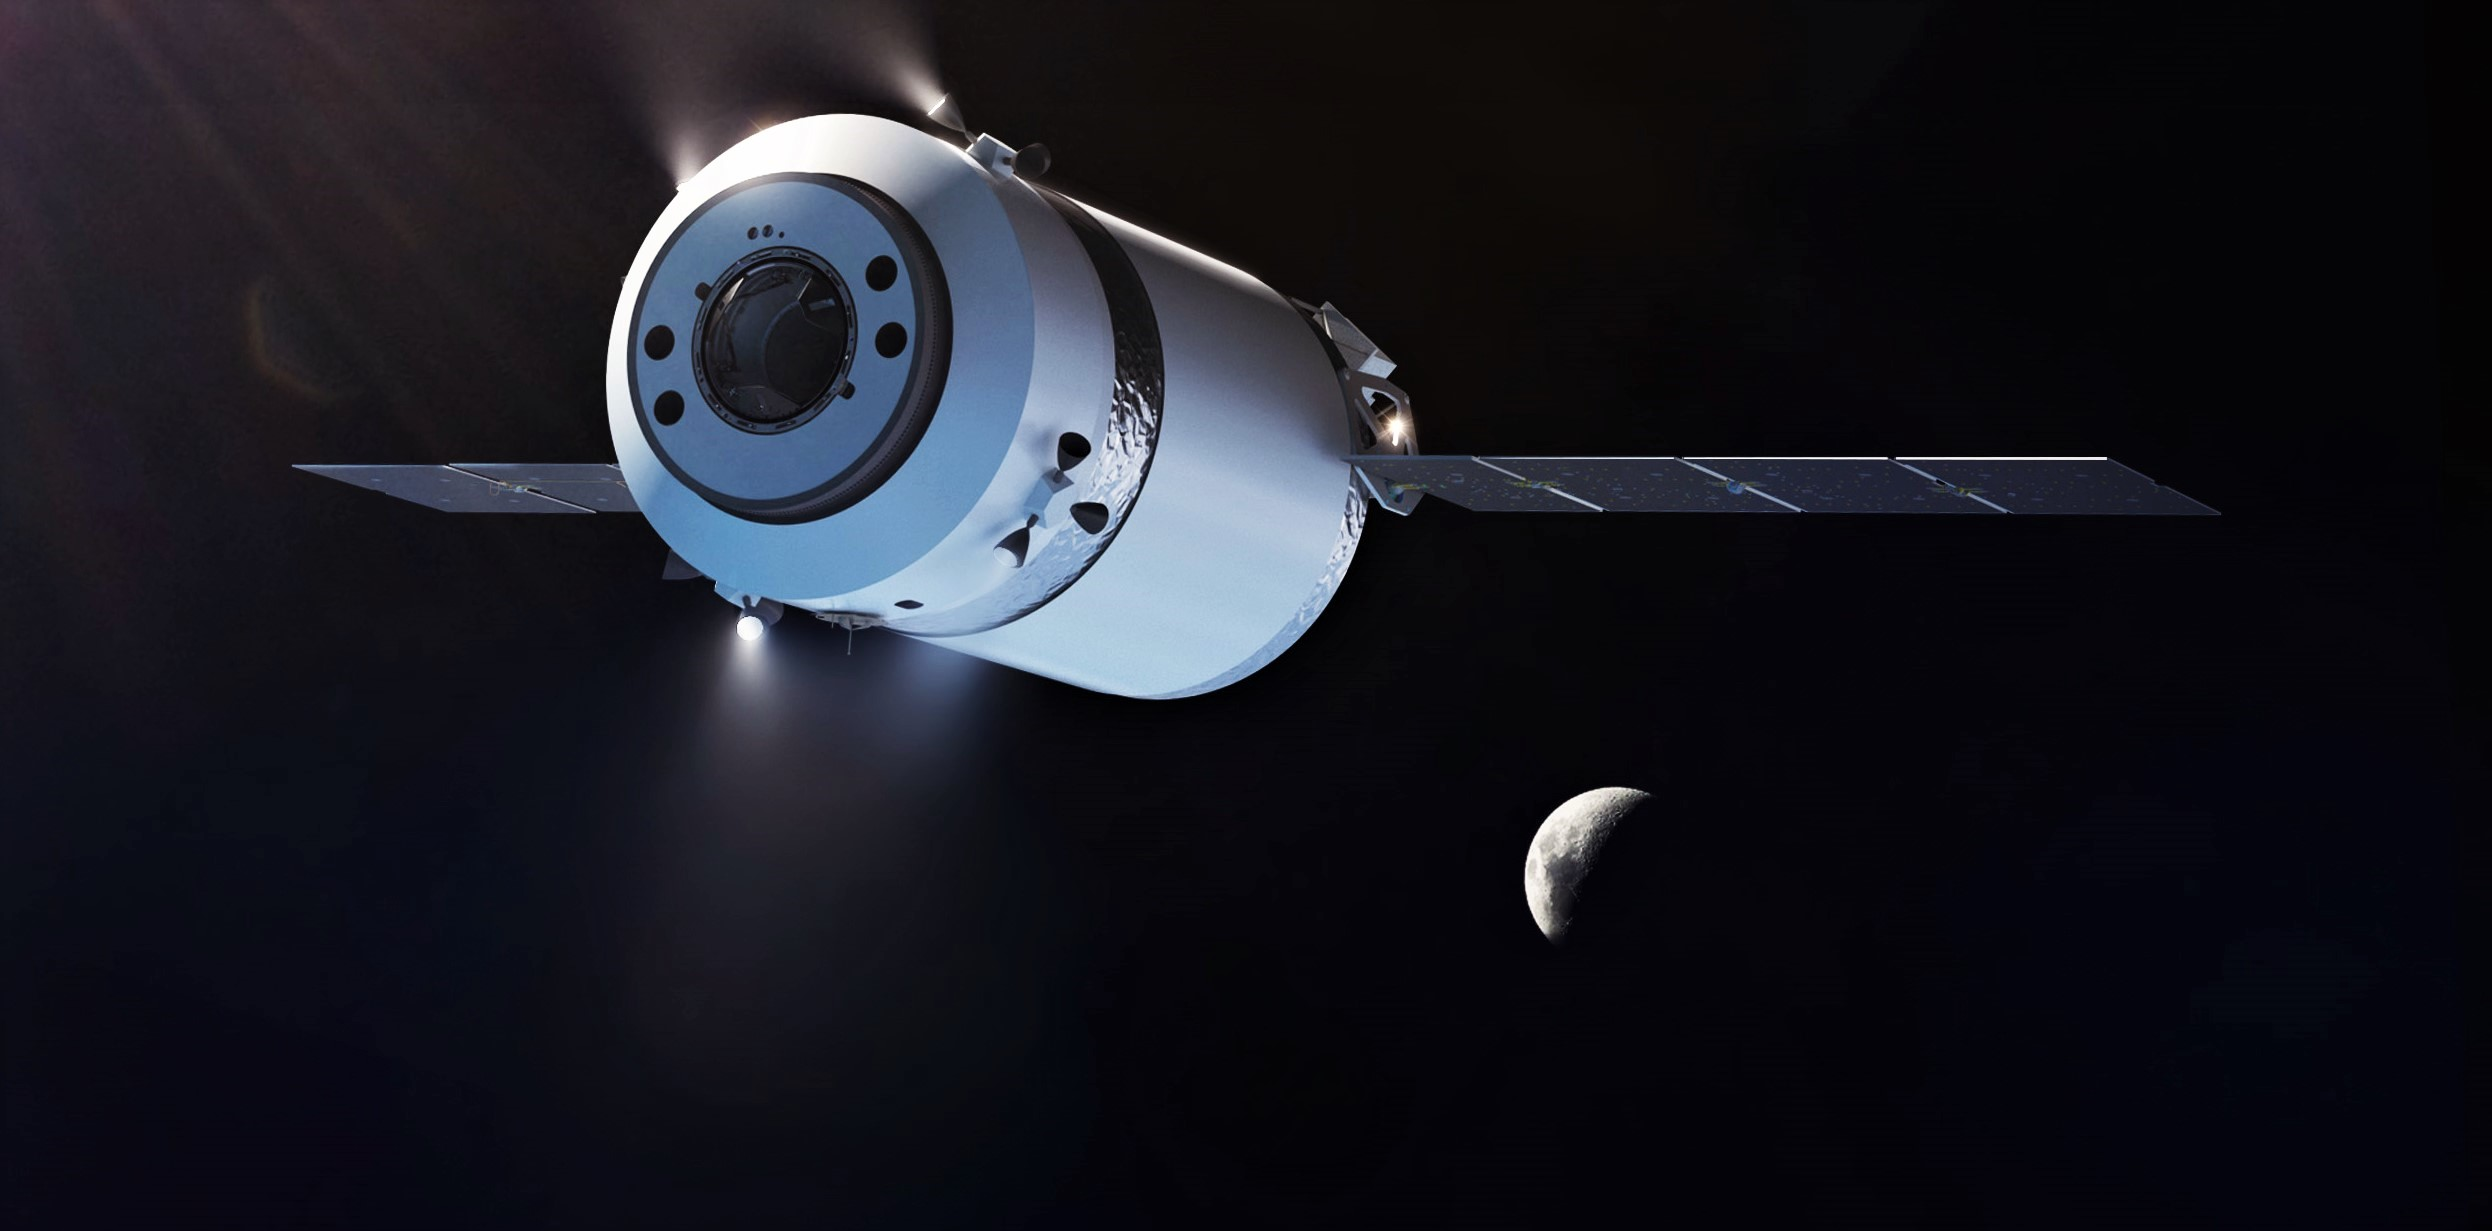 Dragon XL Falcon Heavy render (SpaceX) 1 crop